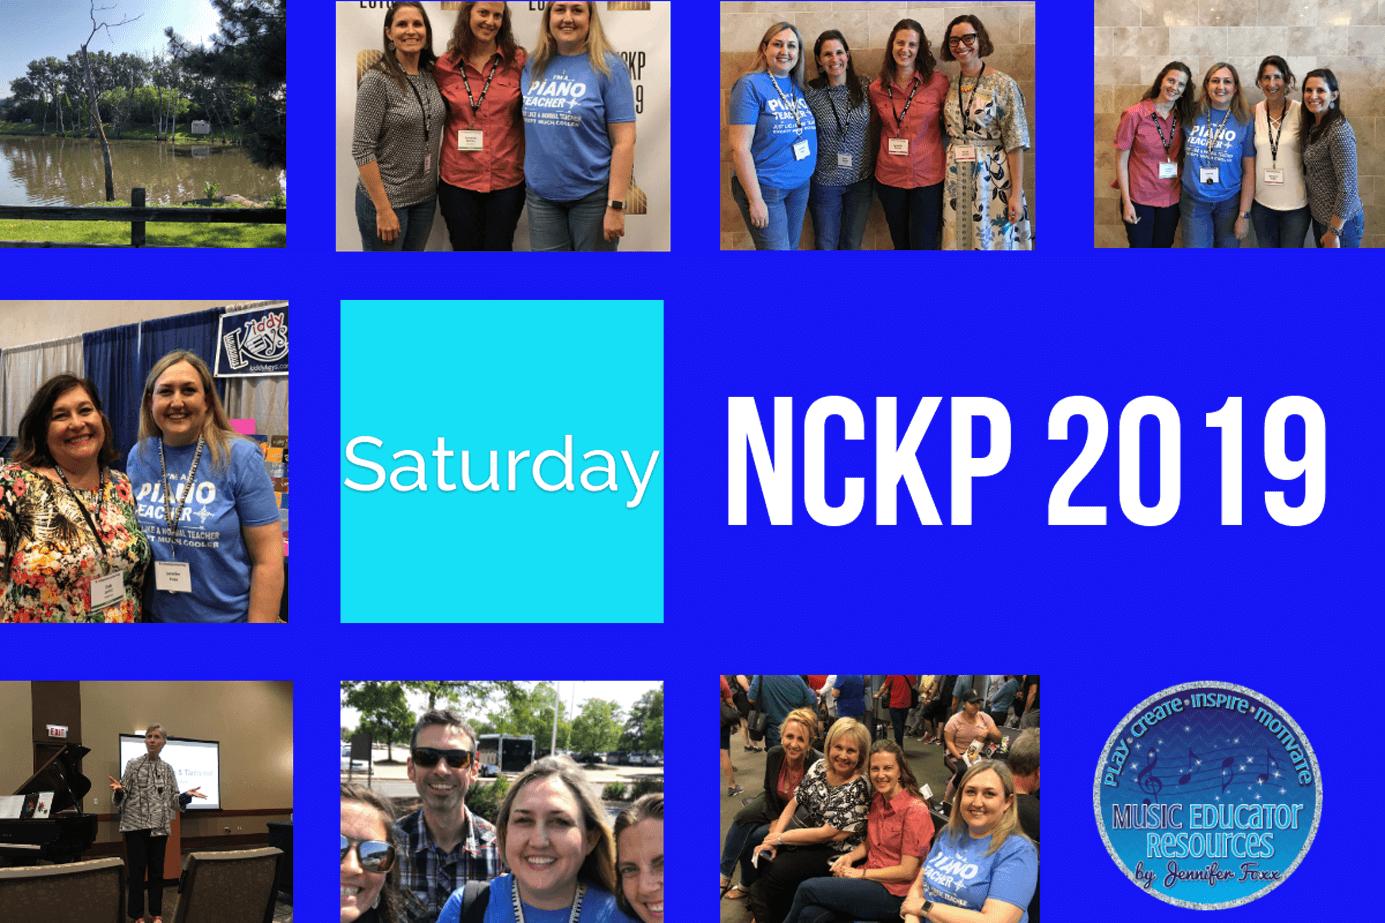 NCKP 2019 Conference Saturday